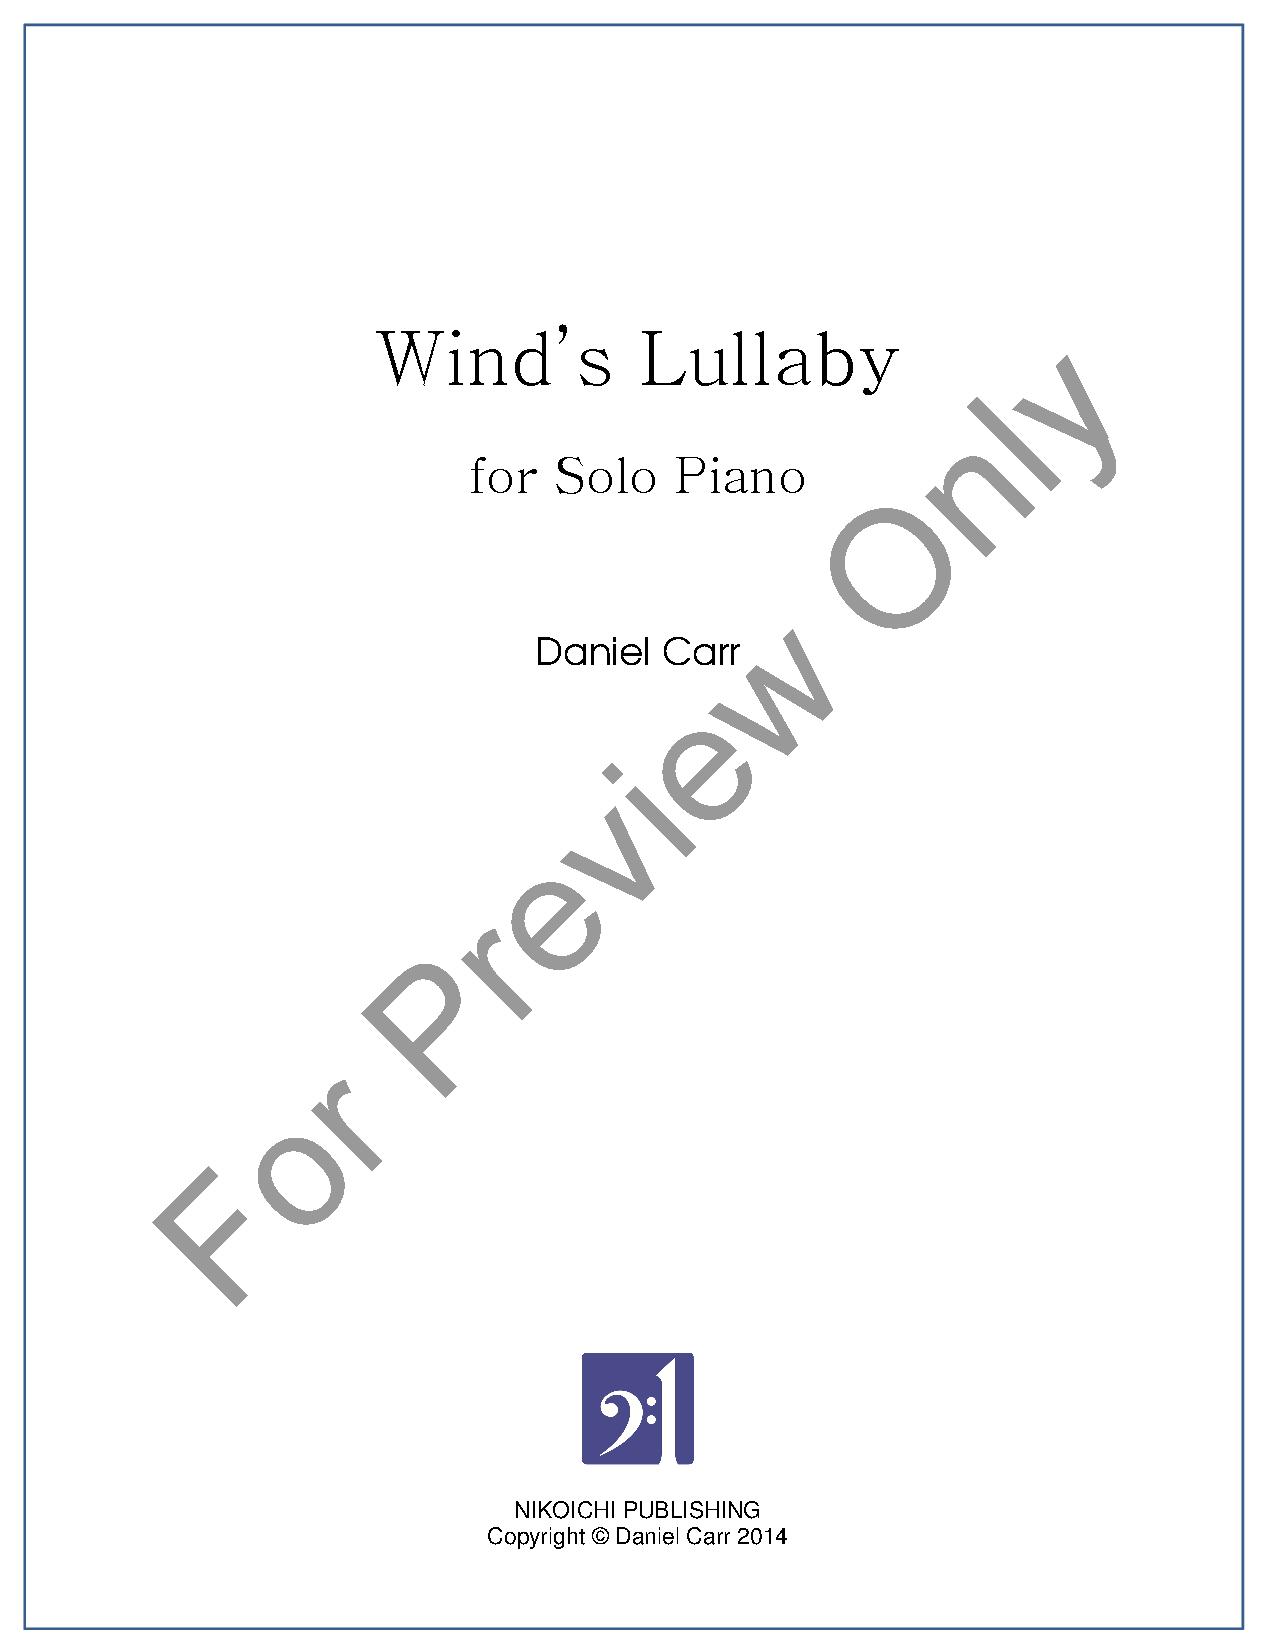 Wind's Lullaby Thumbnail